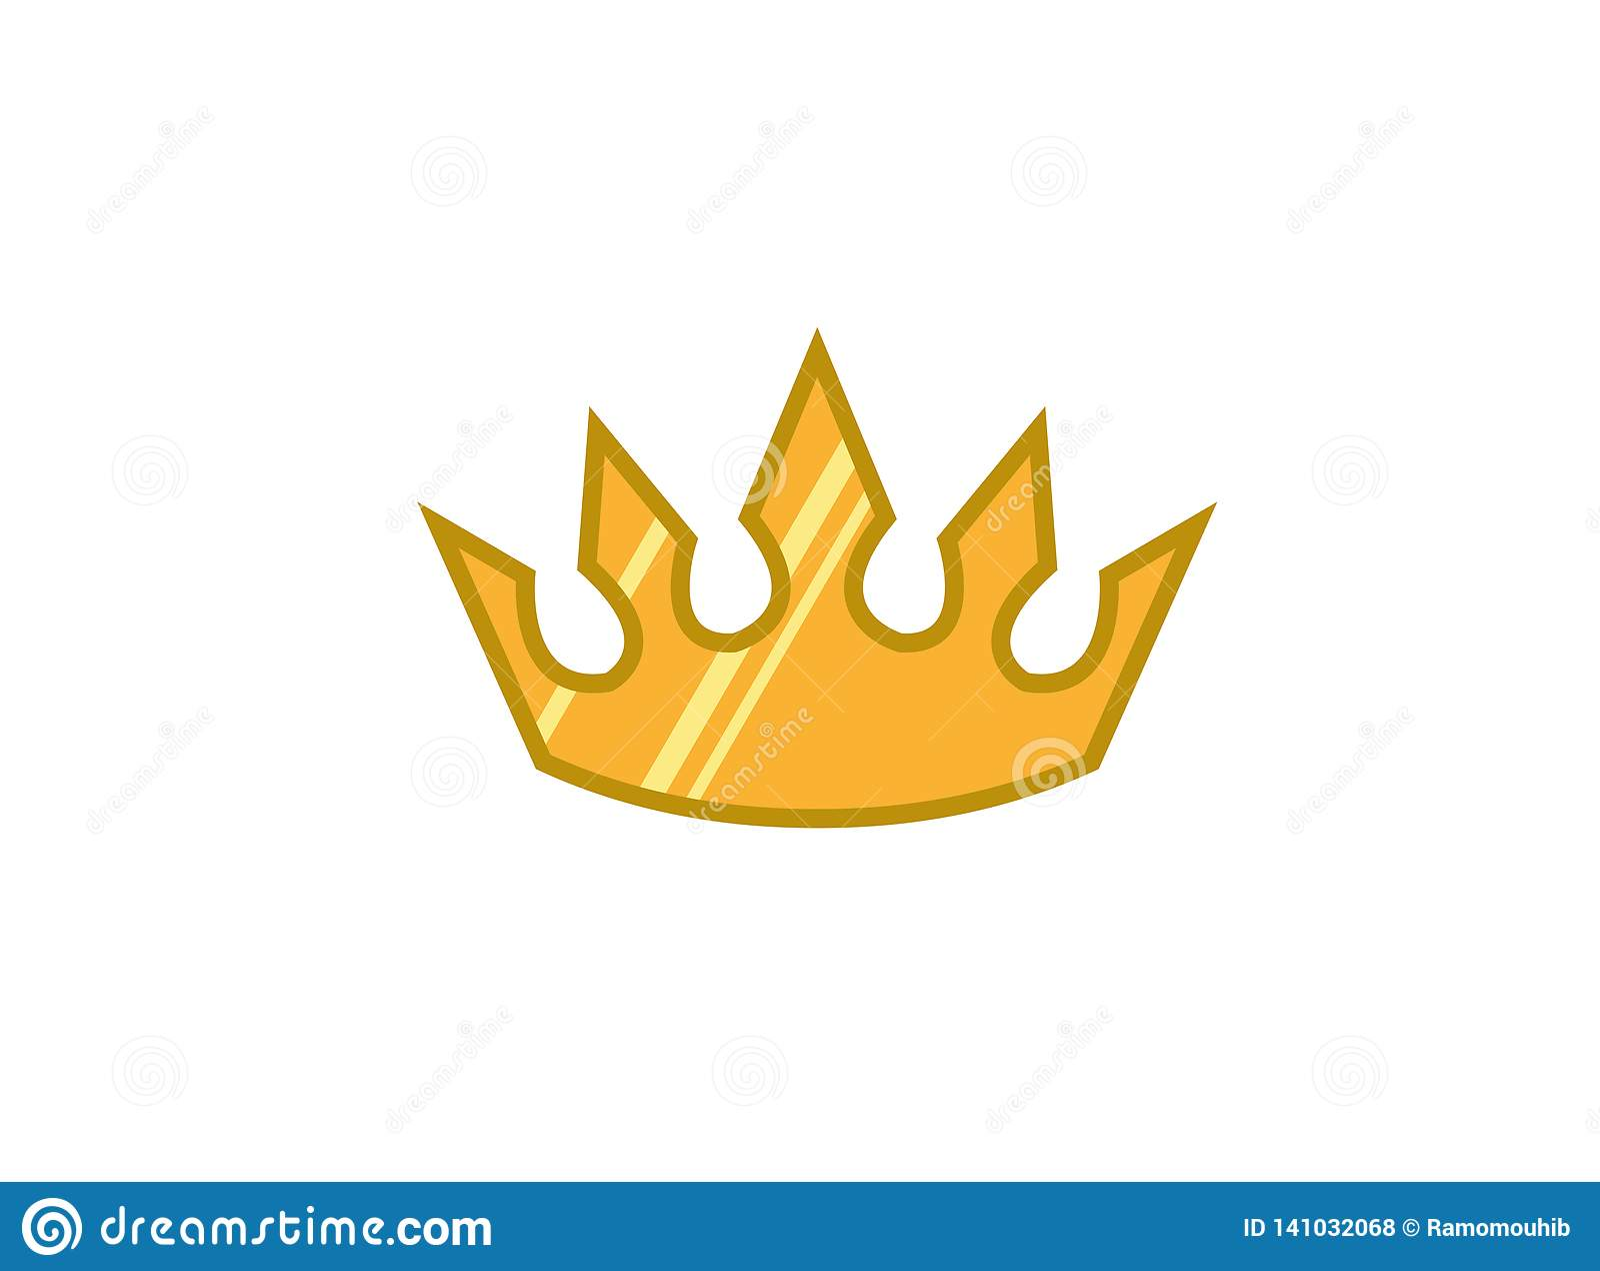 Creative yellow crown for logo design illustration